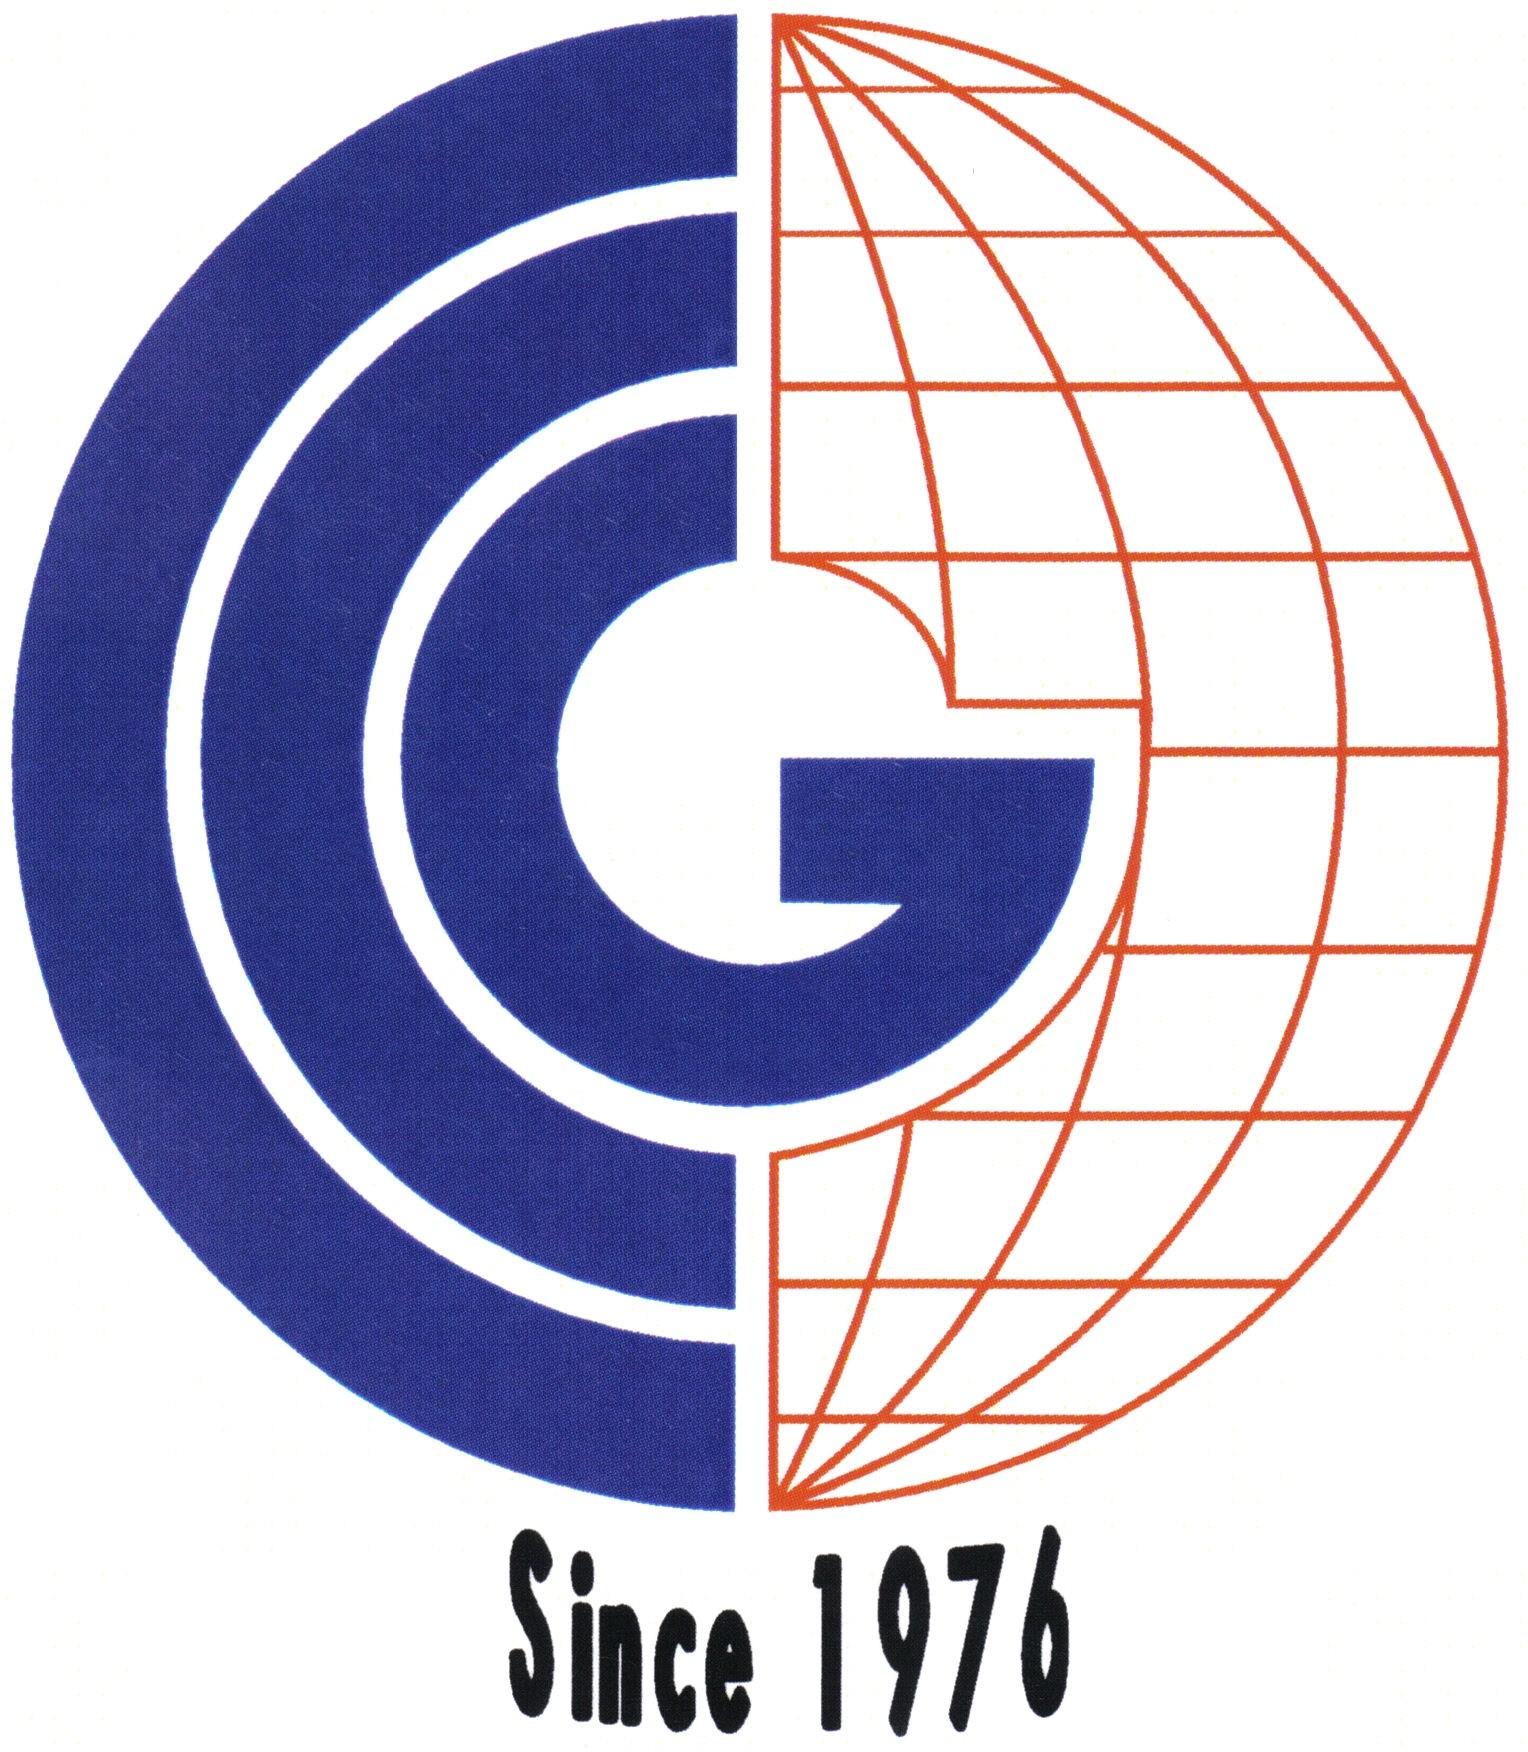 Curlett, Cannon & Galbell Pty, Ltd., Tullamarine